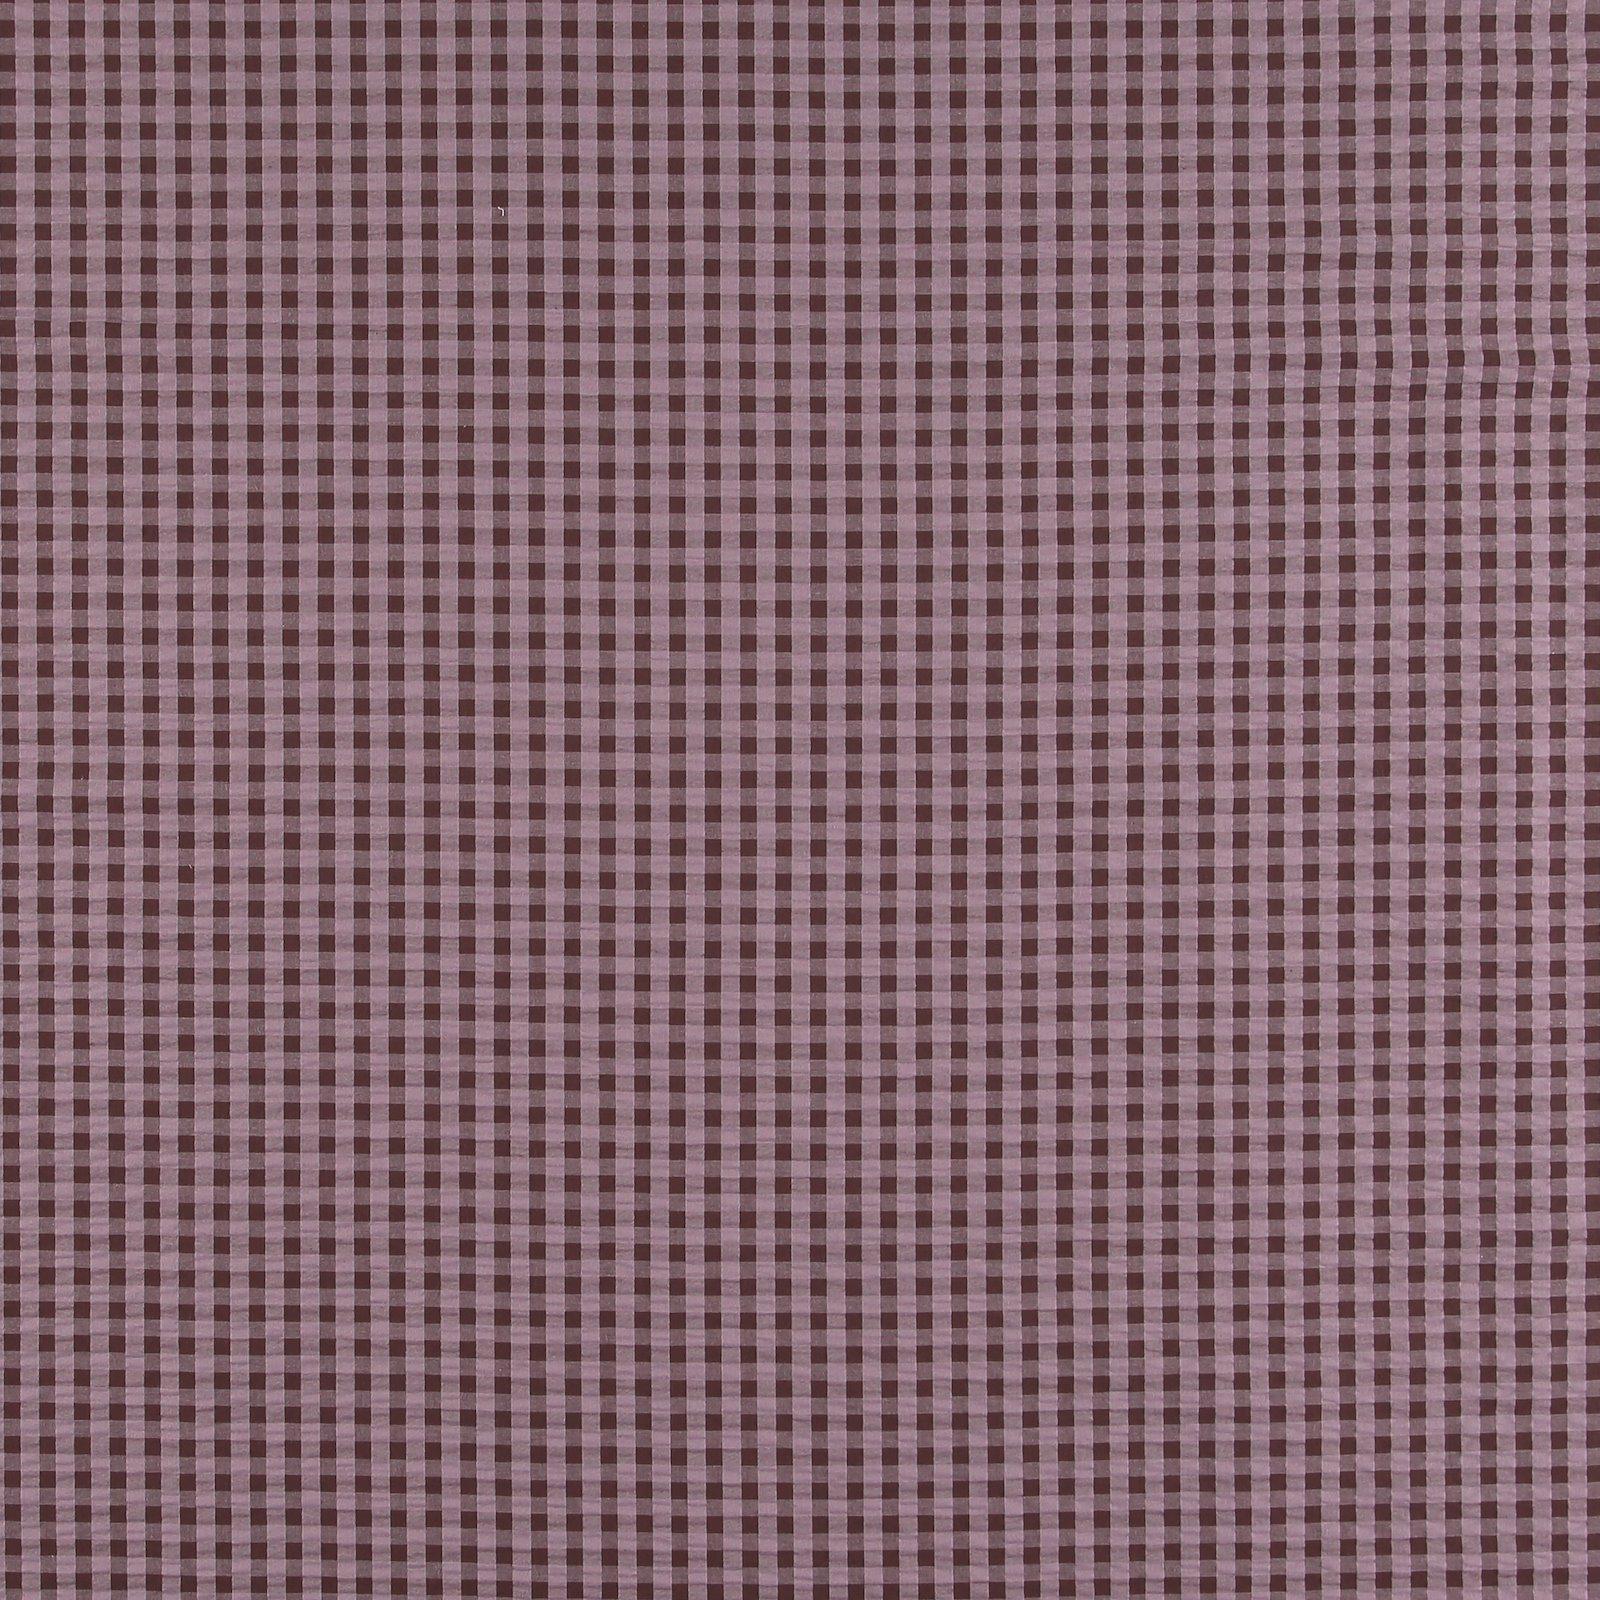 Organic seersucker violet/chestnut check 580070_pack_sp